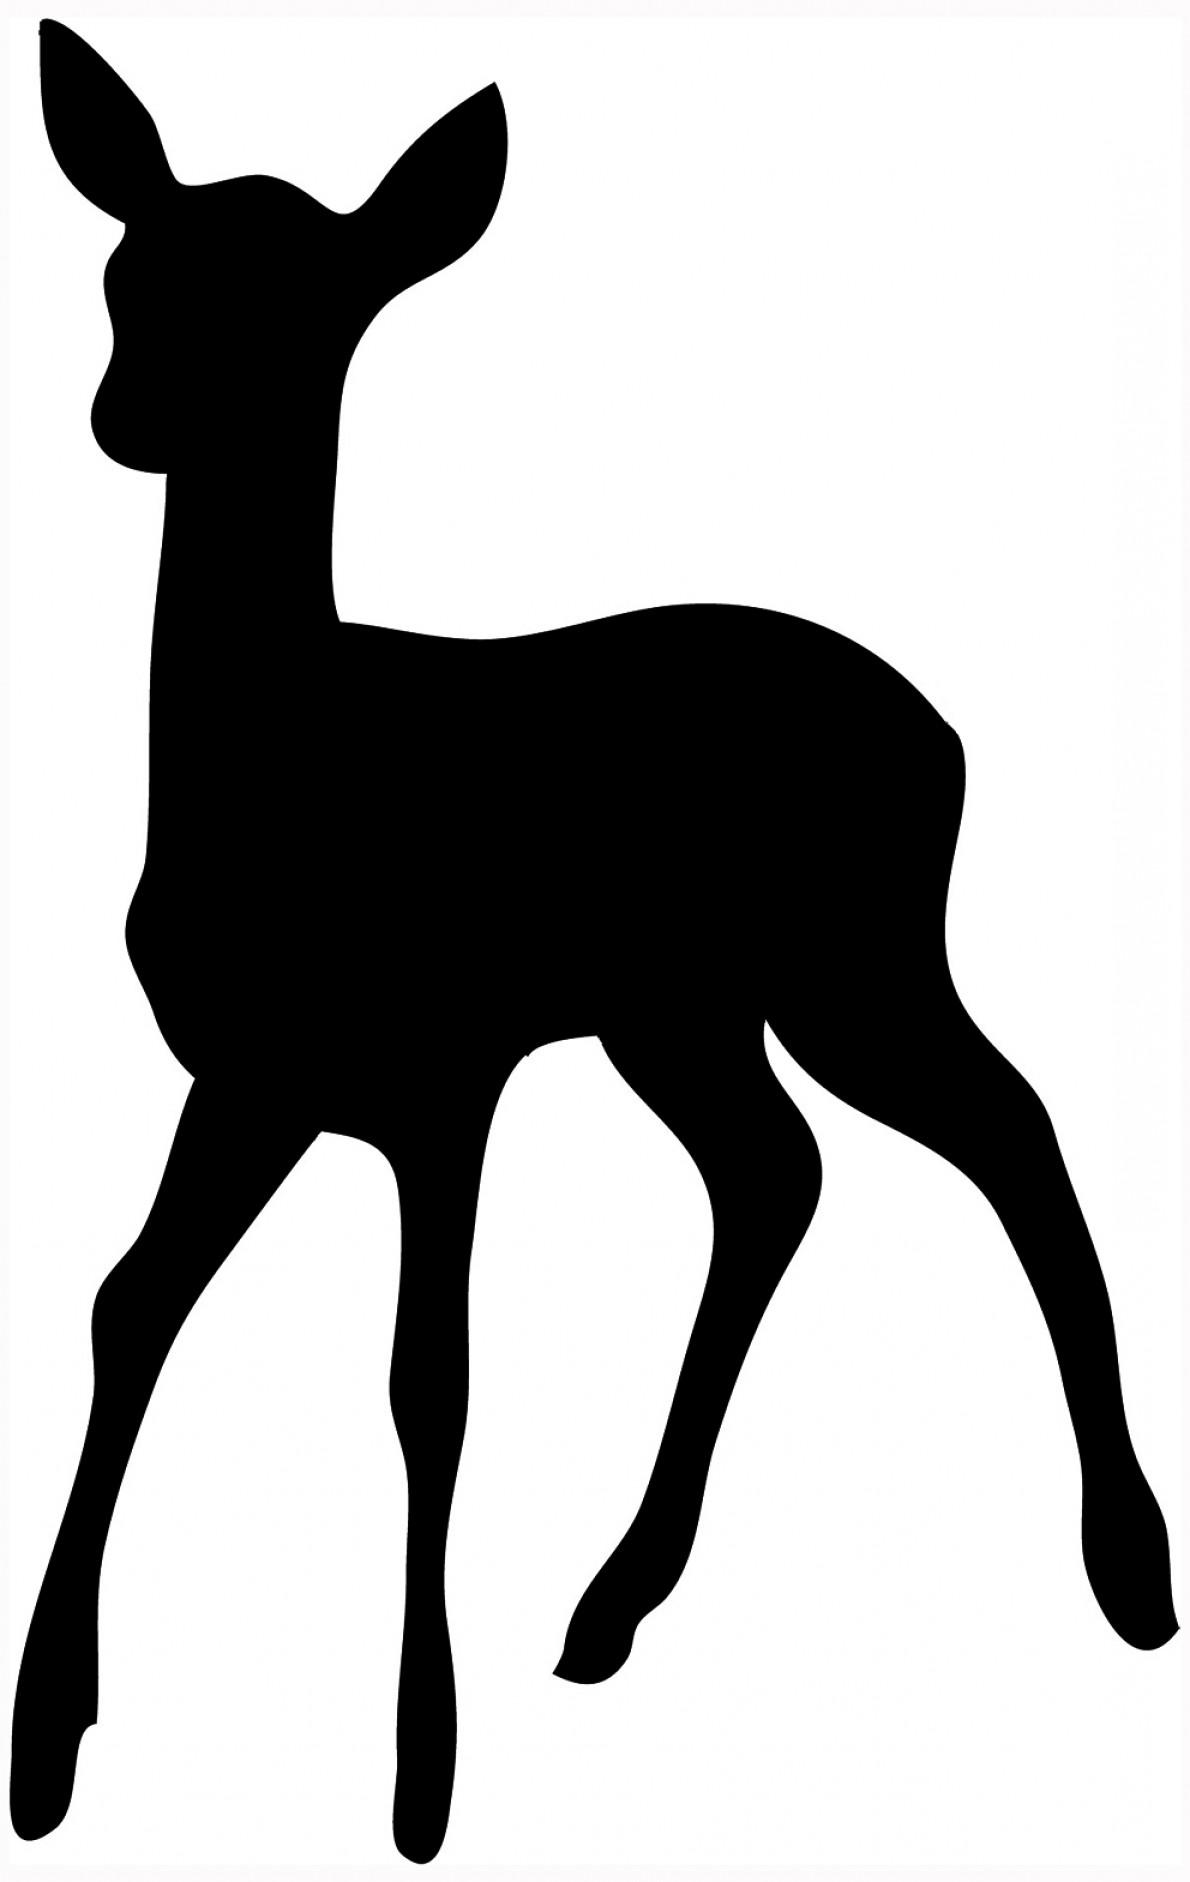 1190x1882 Free Clipart Deer Silhouette Transparent Background Lazttweet